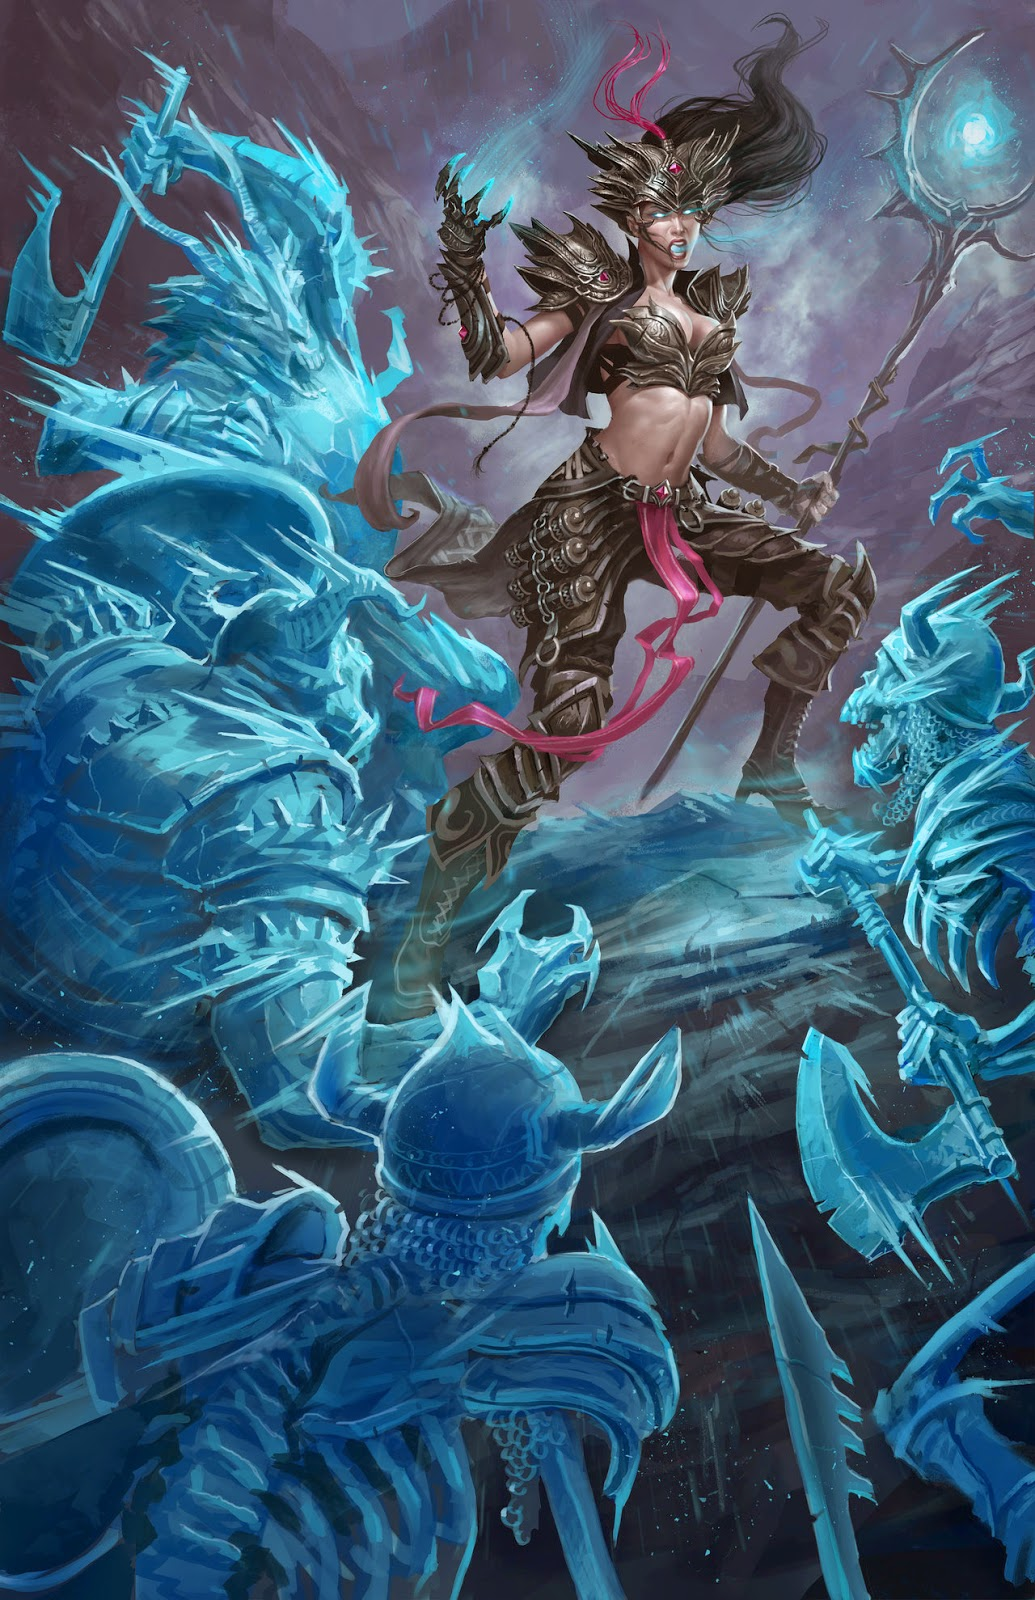 illustration de David Sladek representant une soricère du jeu Diablo